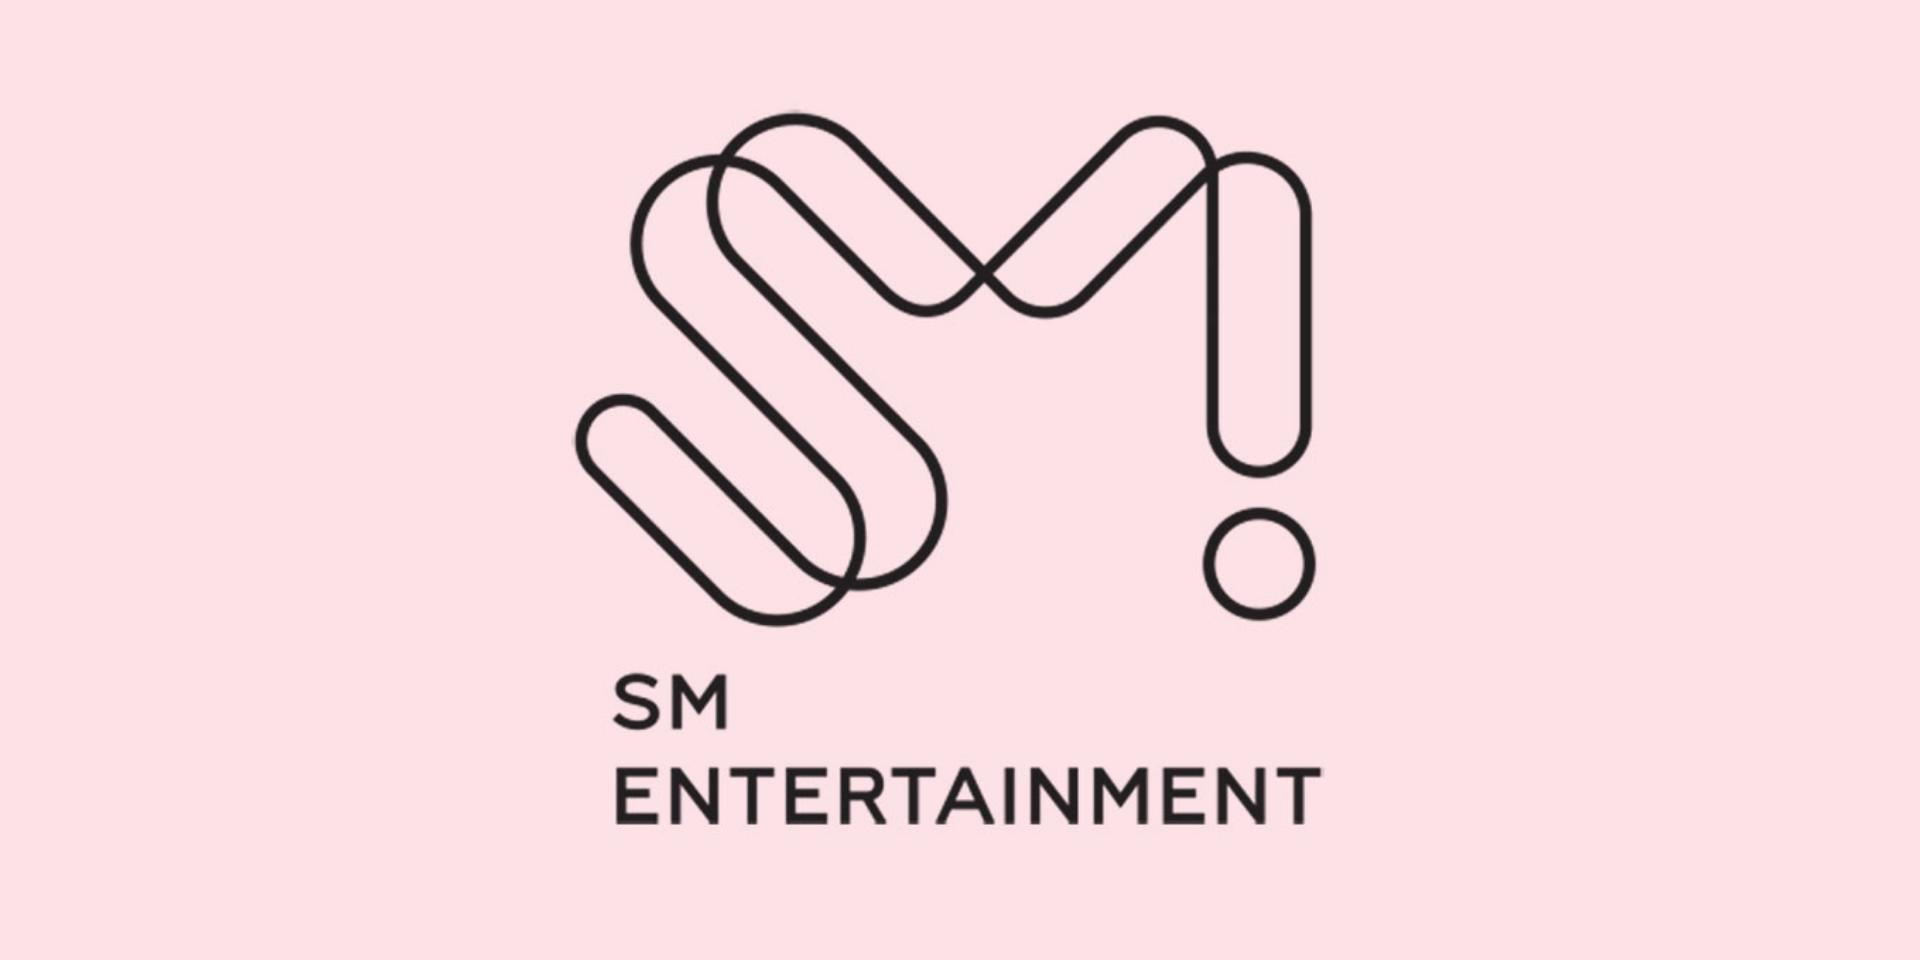 SM Entertainment announces organisation restructure, new non-music subsidiary 'SM Studios'